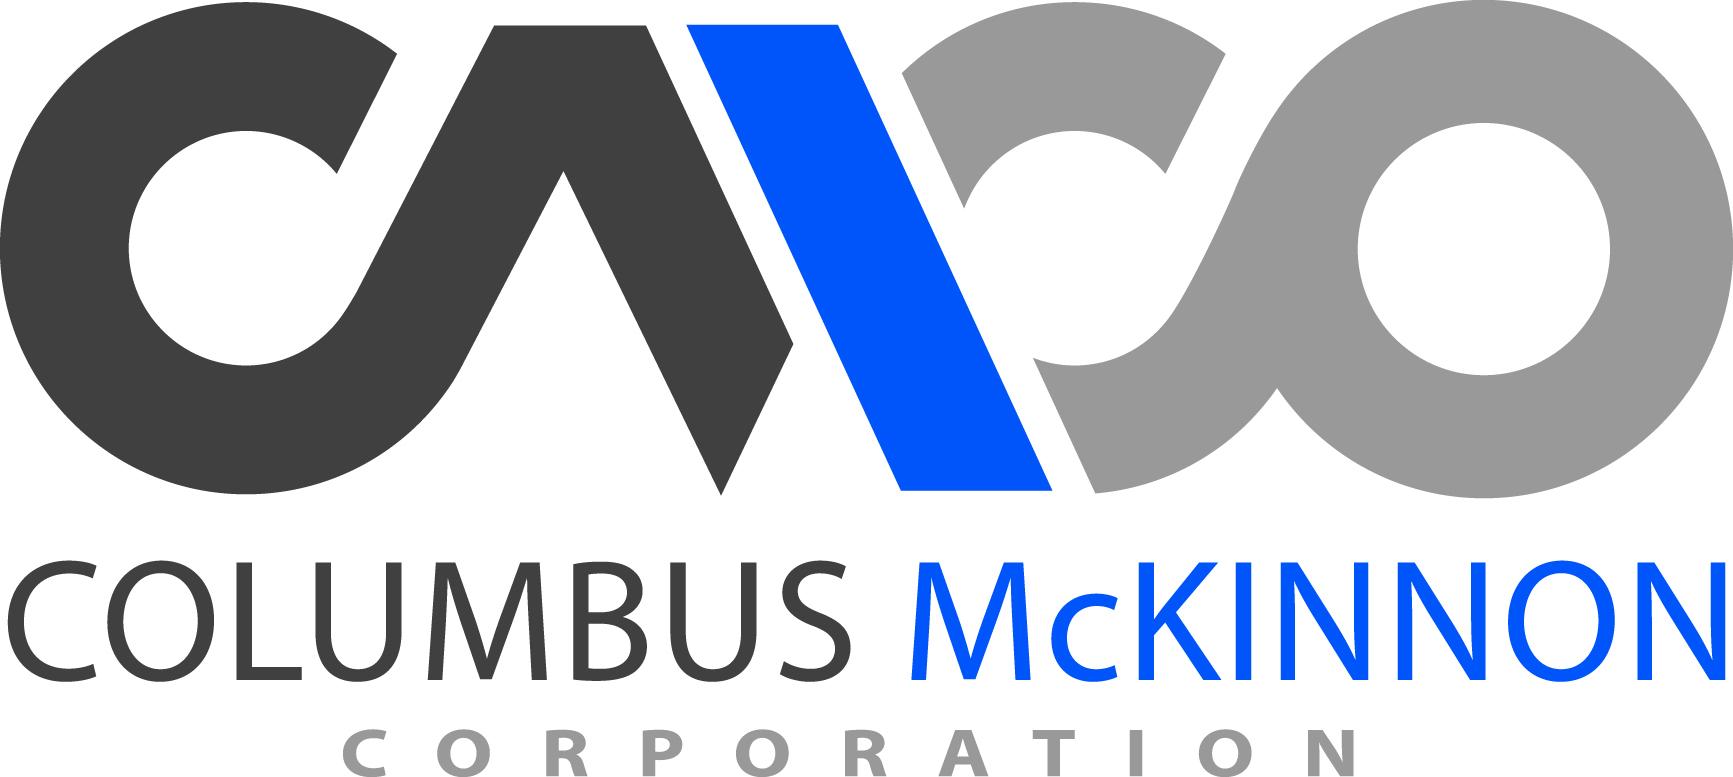 CMCO_logo.jpeg